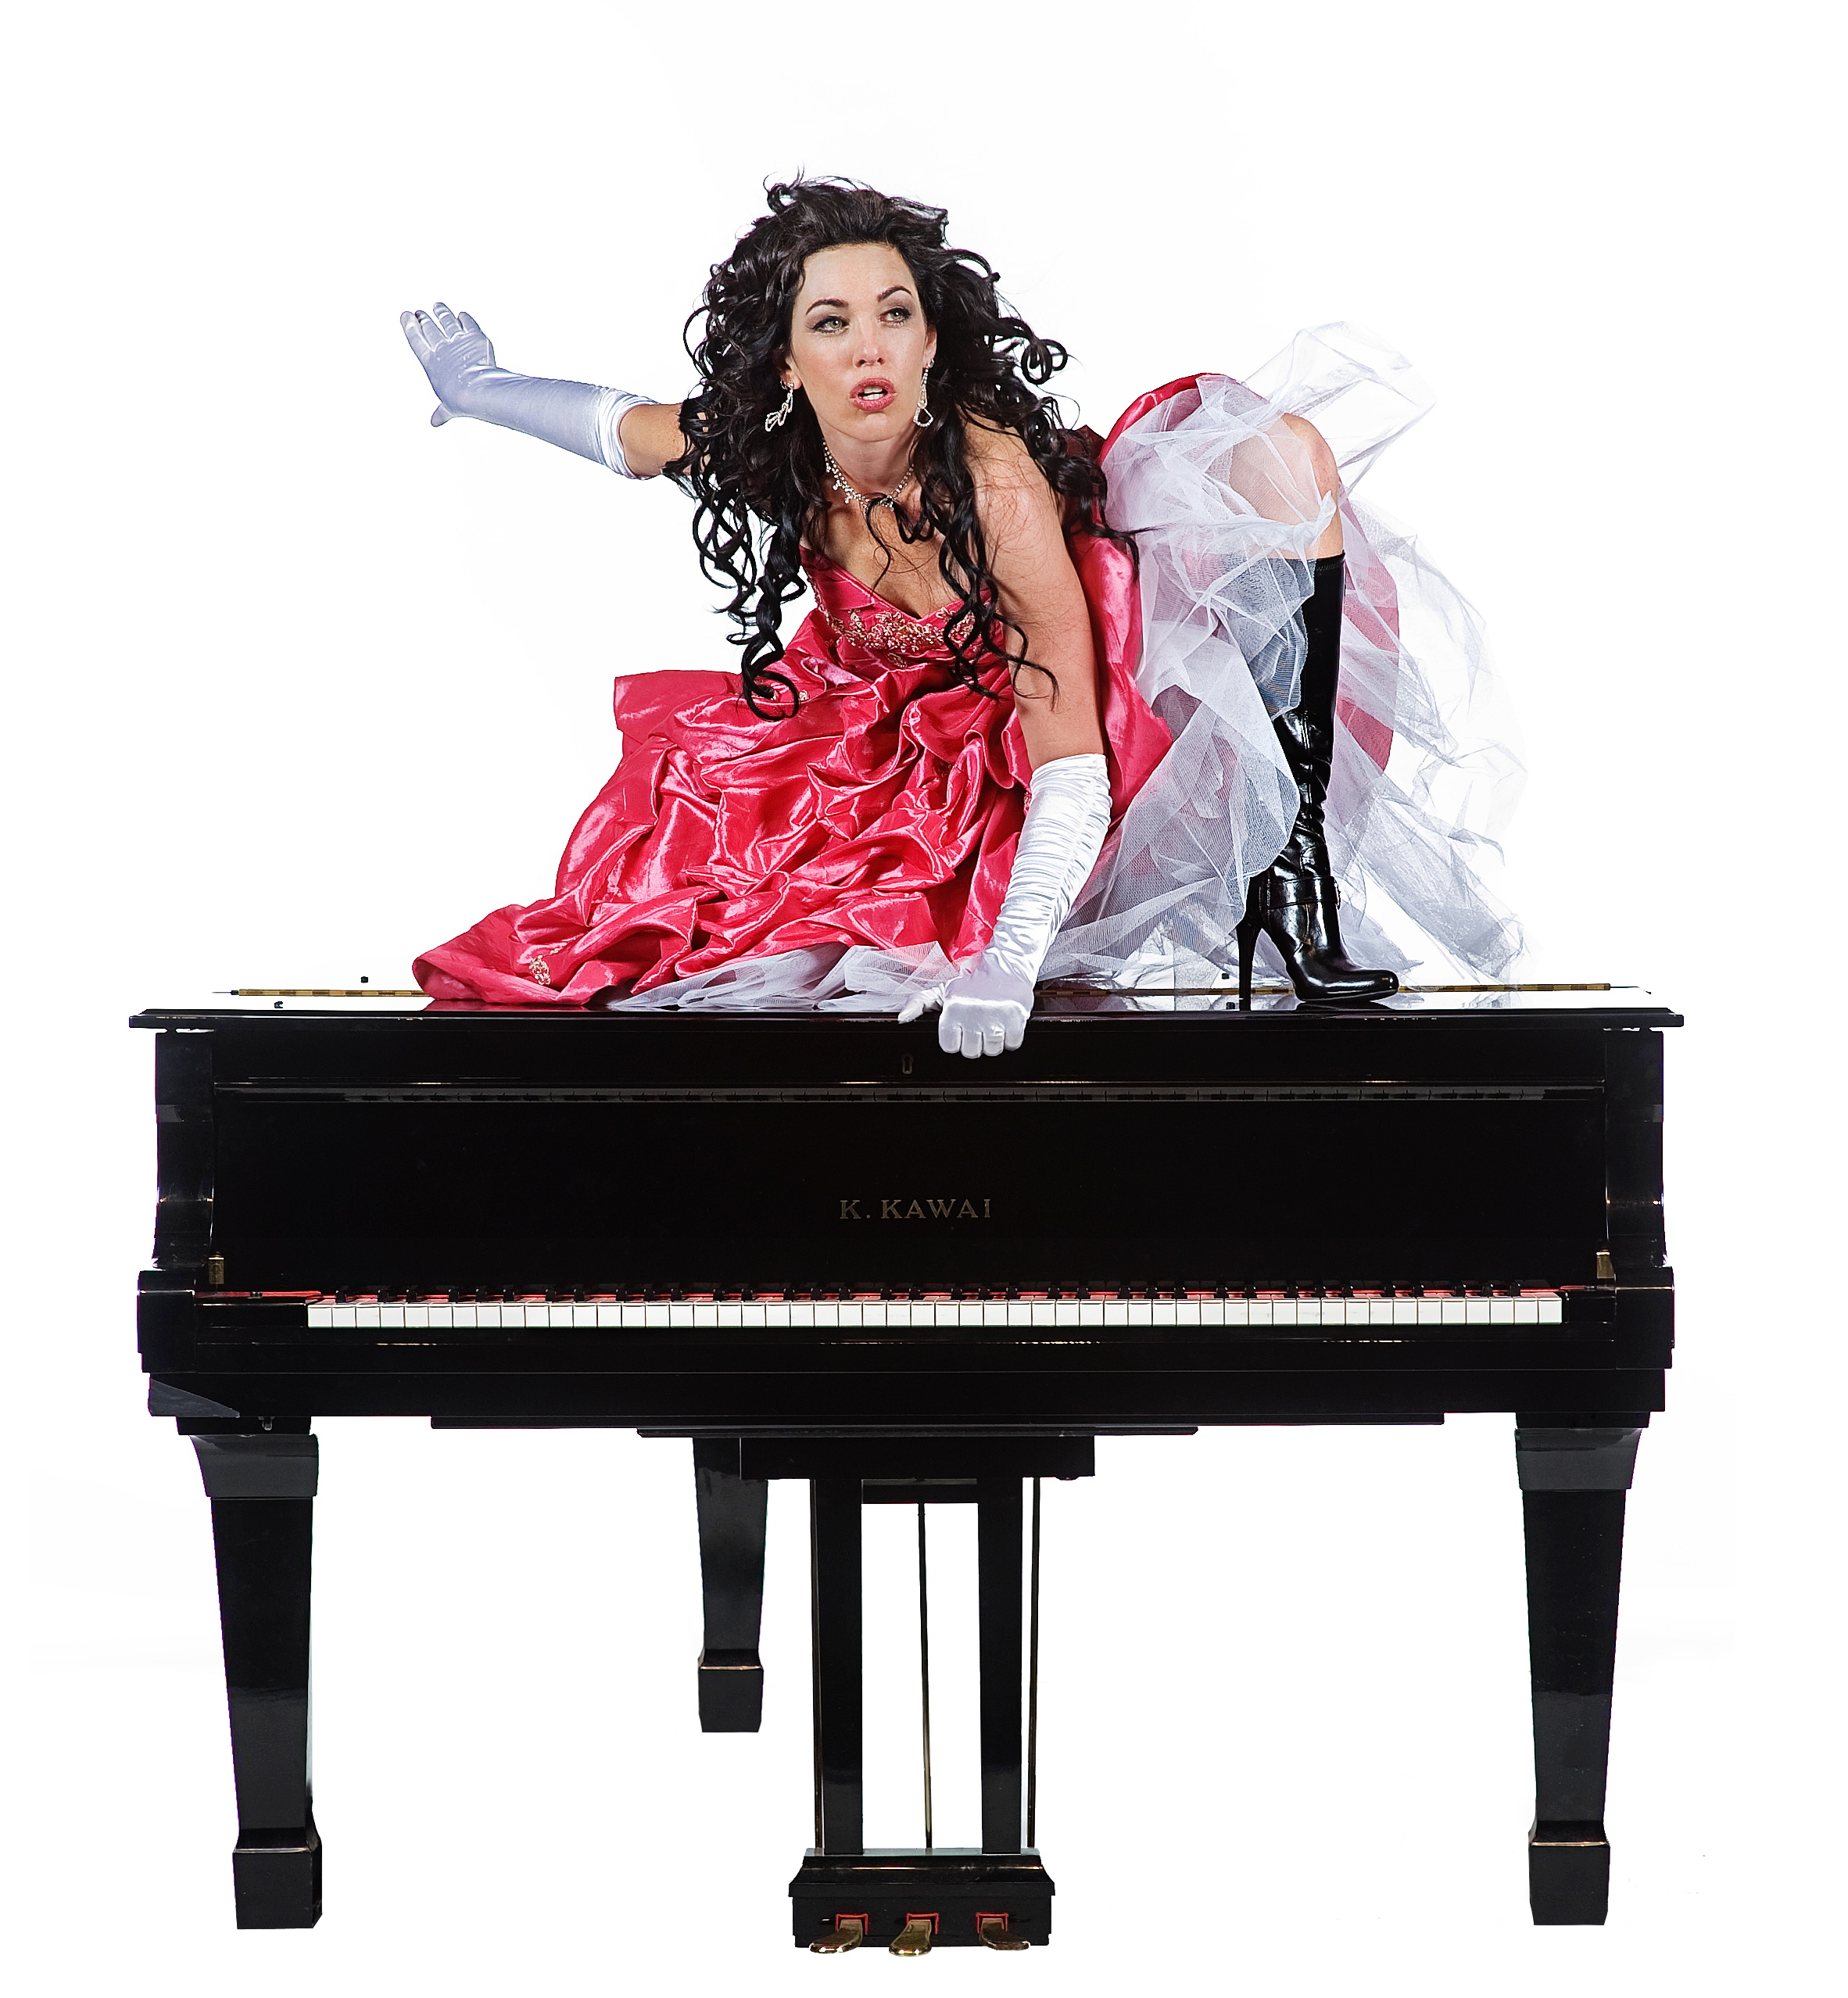 Katie Goodman Liberal Musical Comedian based in NYC